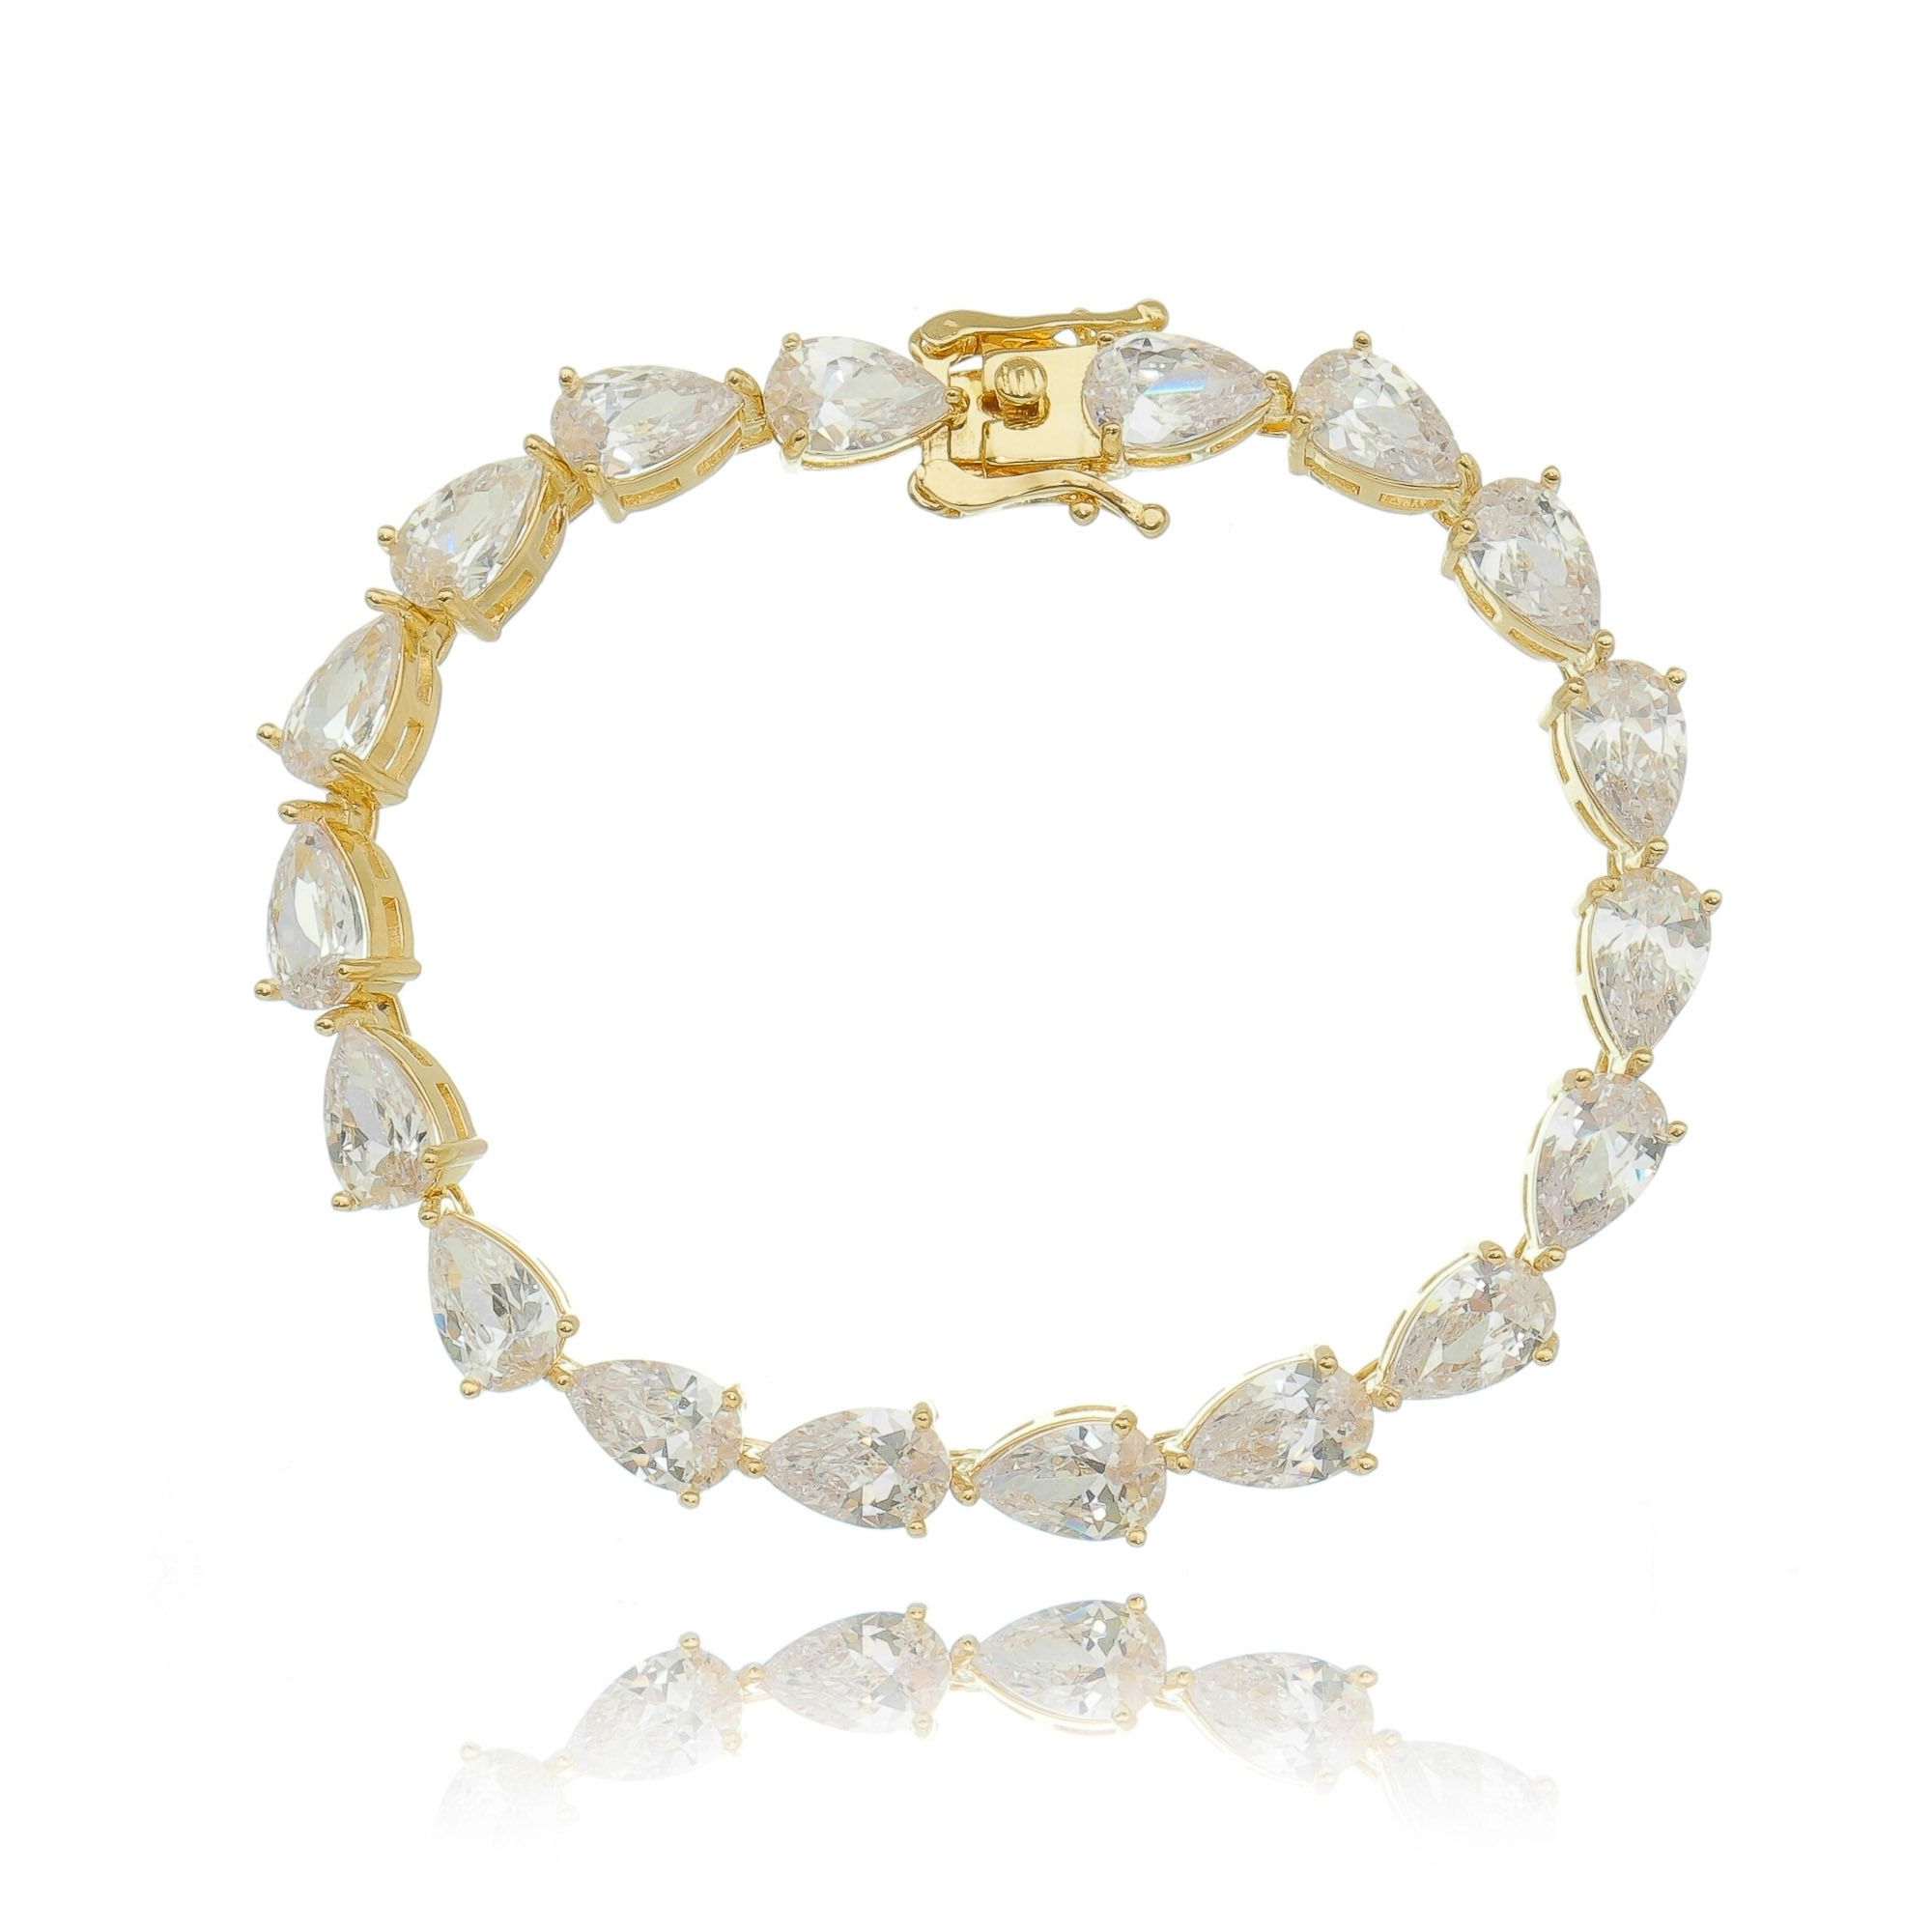 Pulseira Riviera Gota Cristal Dourada Semijoia Luxuosa Ouro  - Soloyou